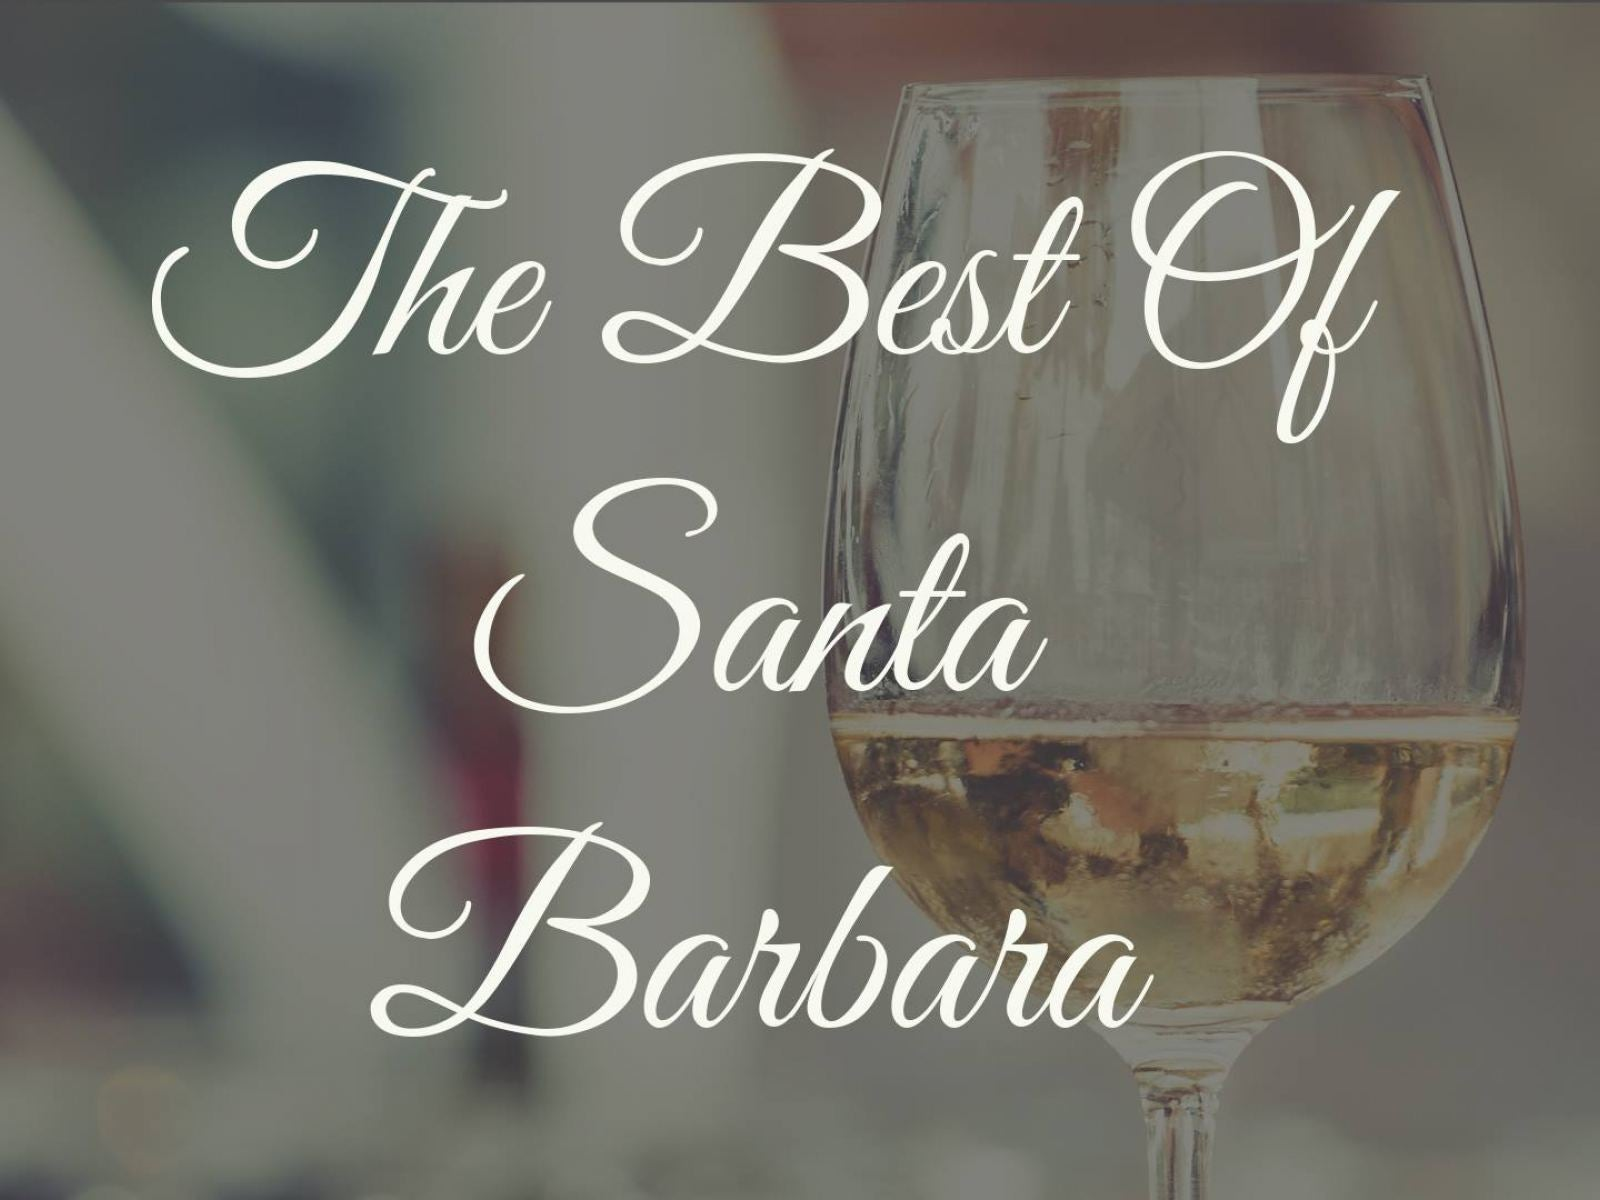 The Best Of Santa Barbara